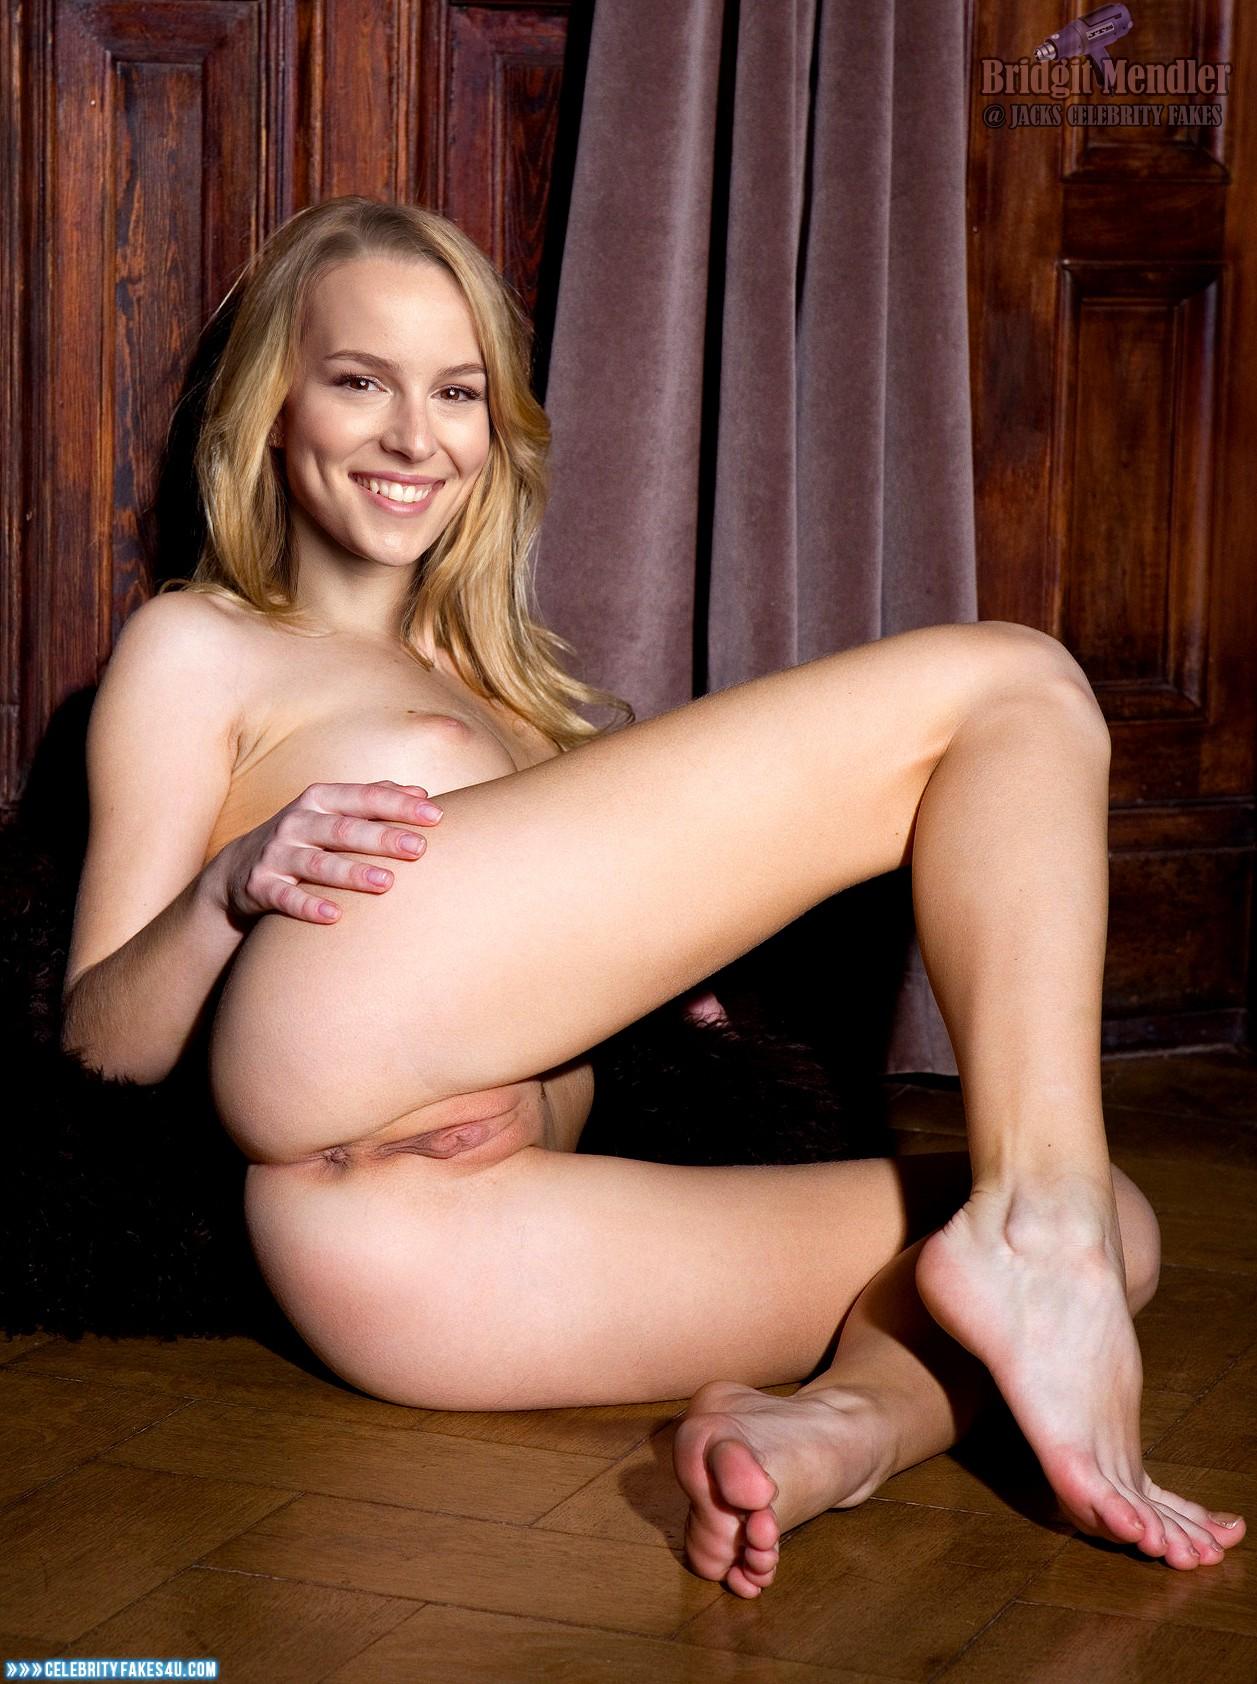 Bridgit Mendler Naked bridgit mendler ass pussy nsfw 001 � celebrity fakes 4u